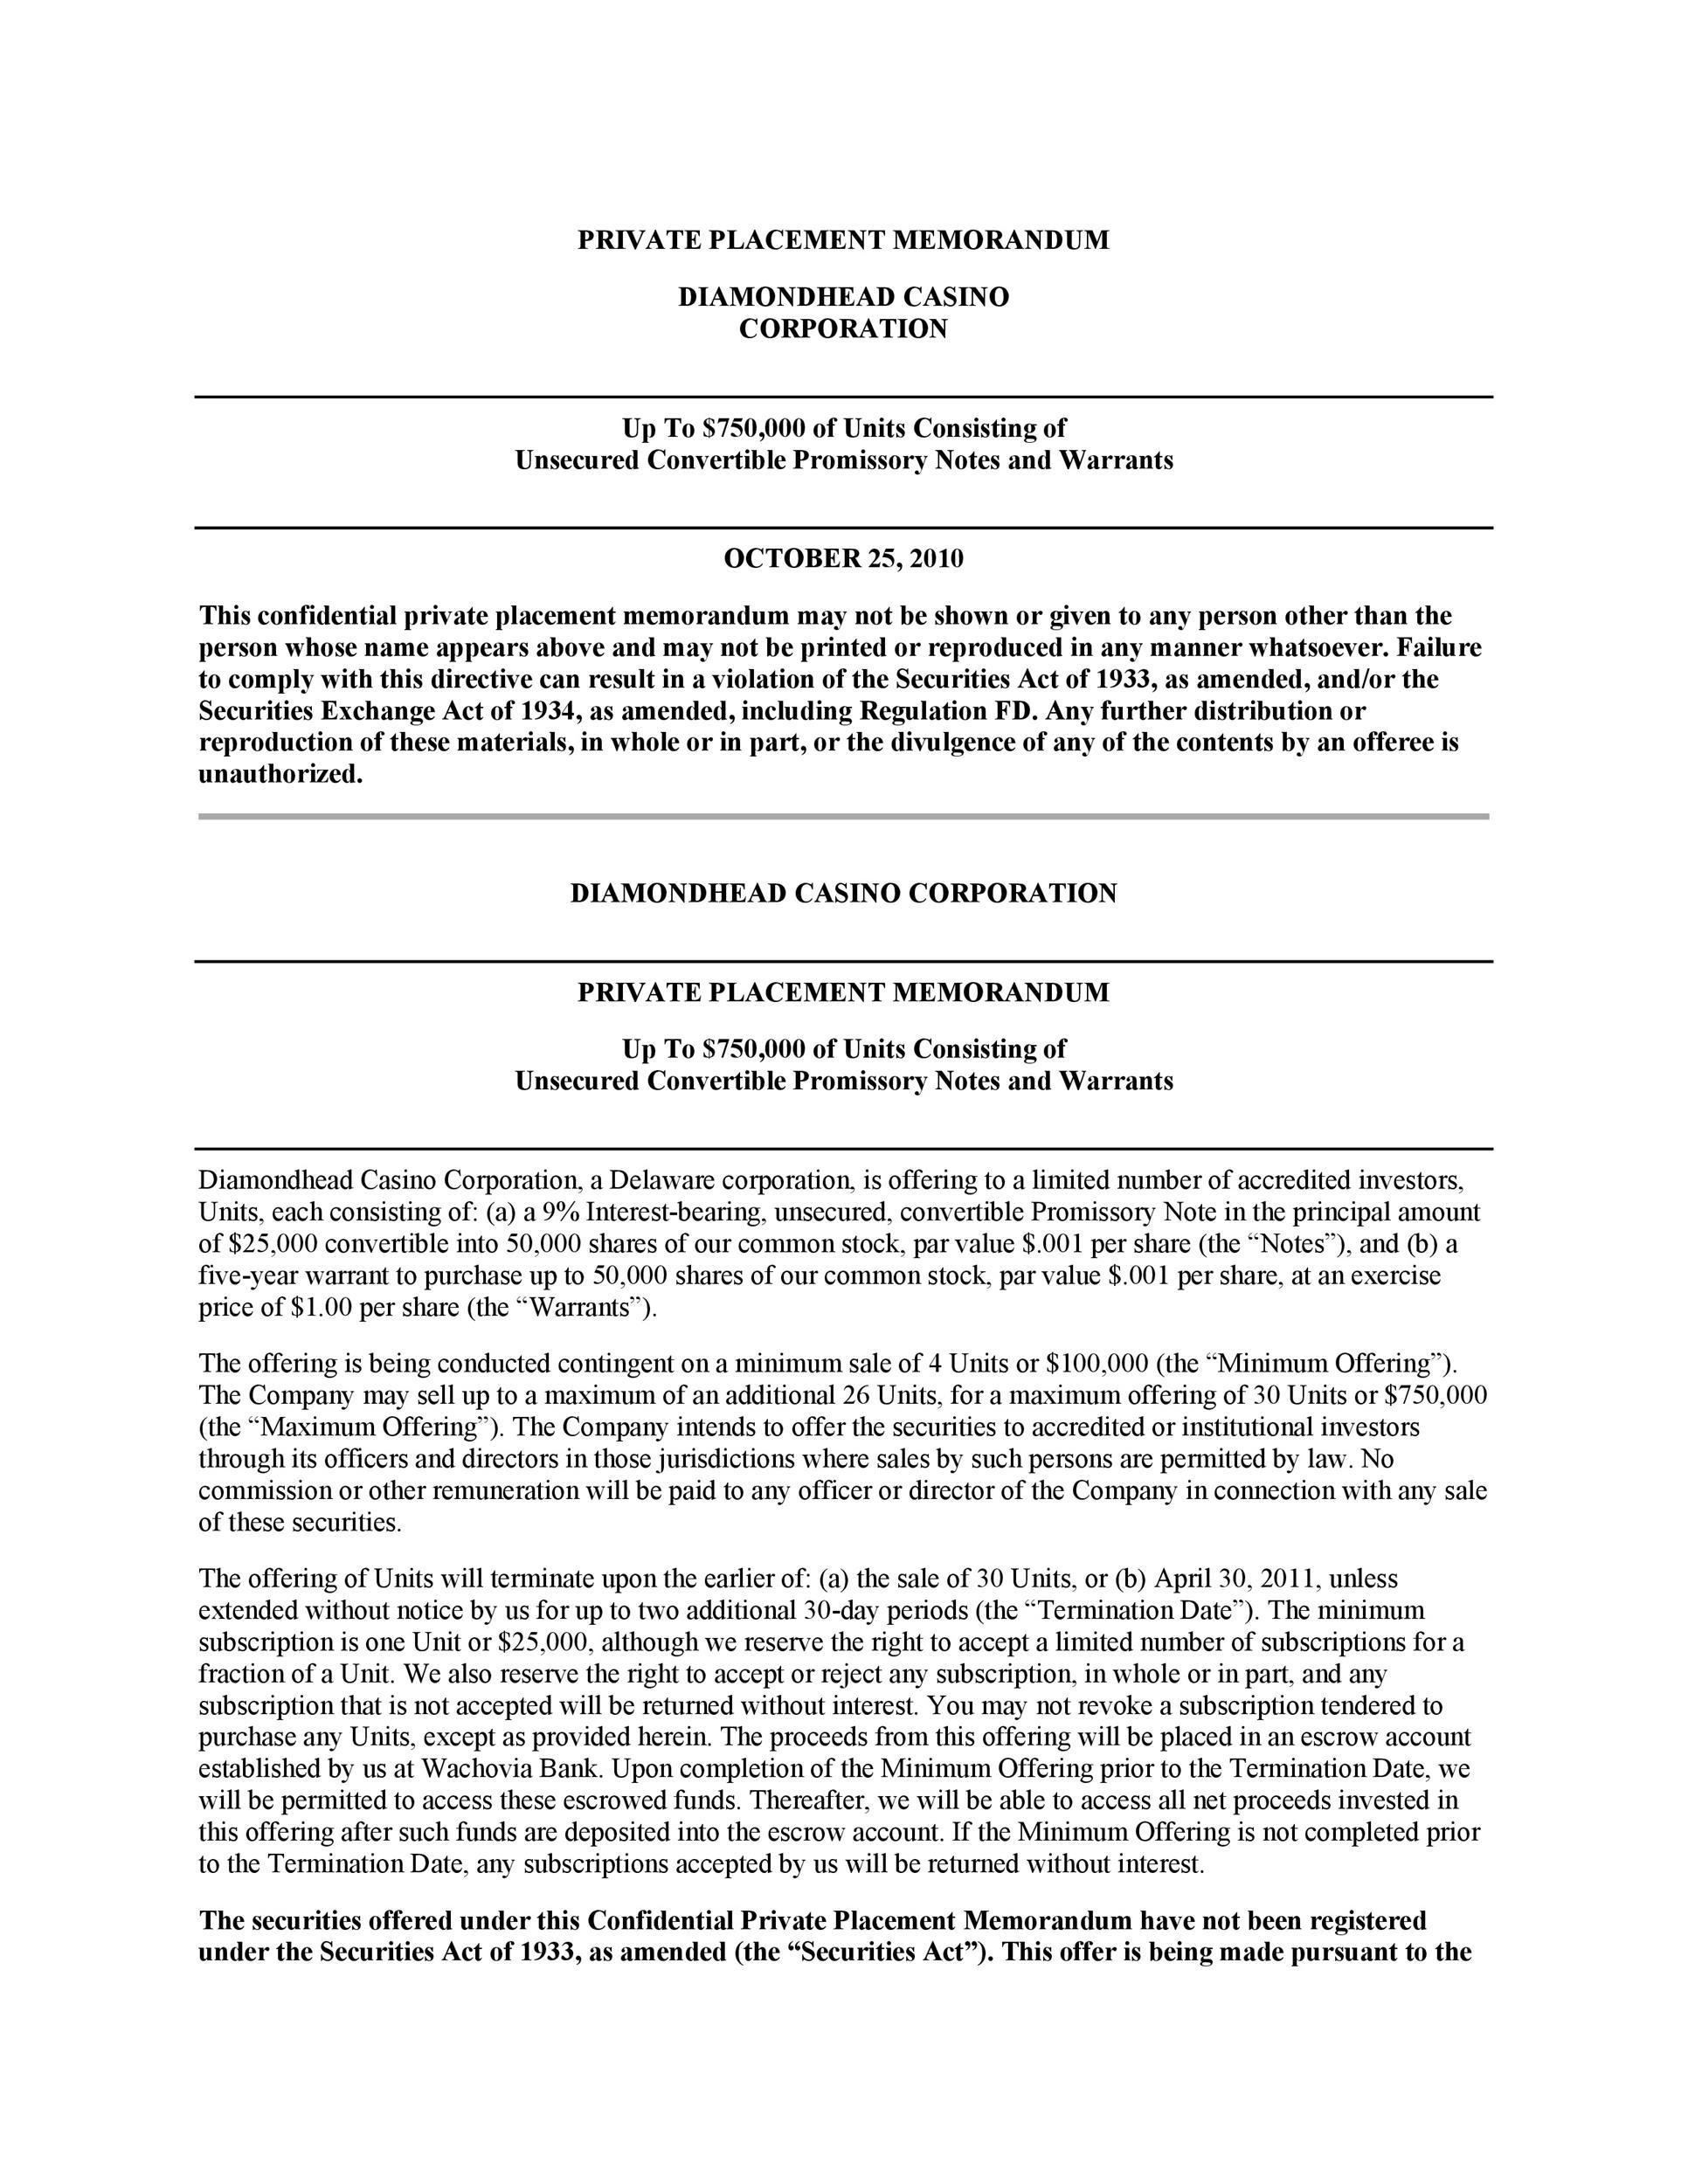 Free private placement memorandum template 22